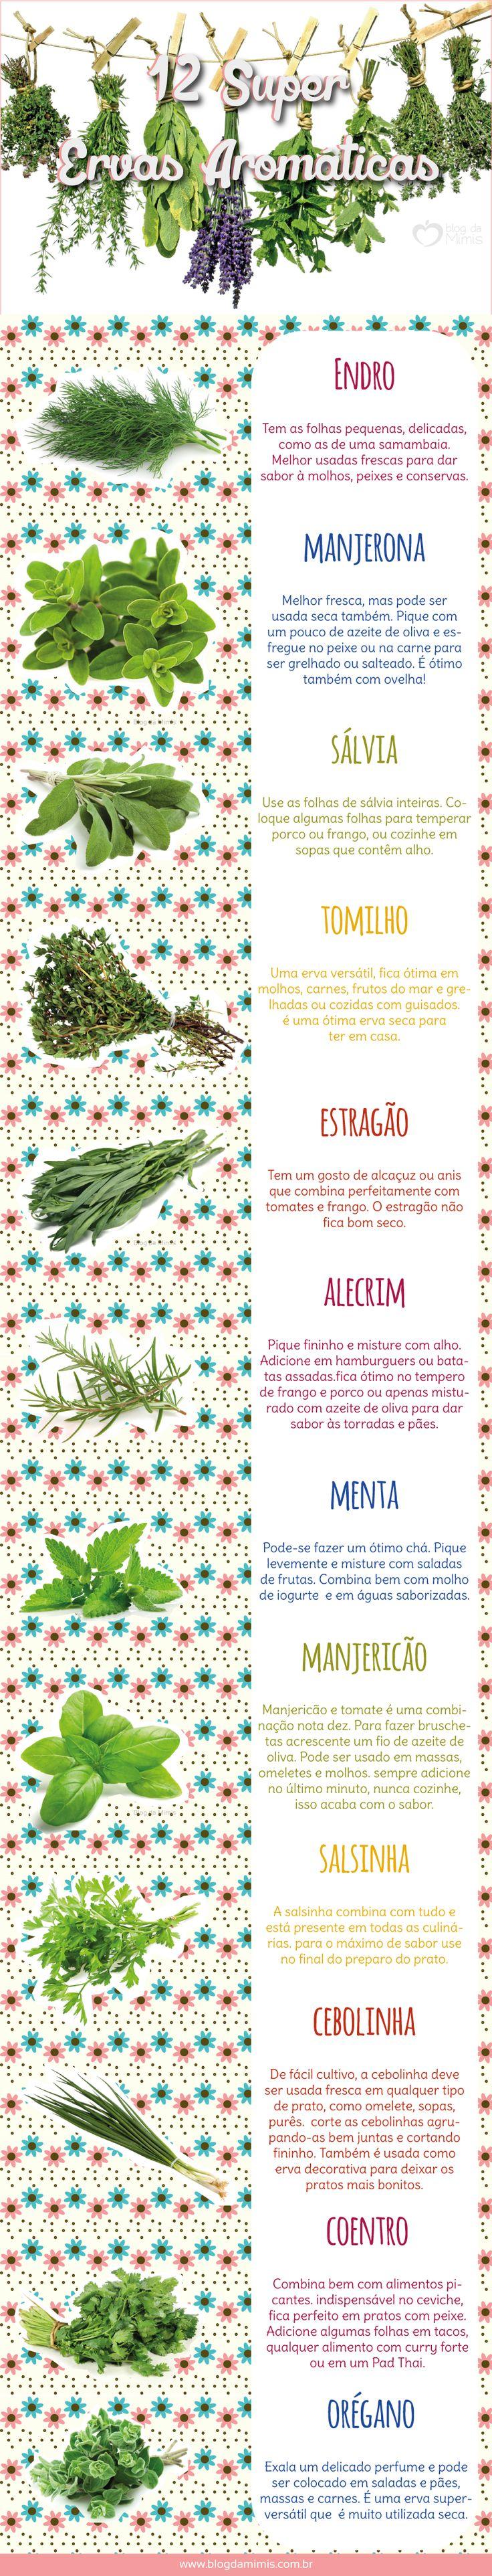 12-Super-Ervas-Aromáticas-blog-da-mimis-michelle-franzoni-post